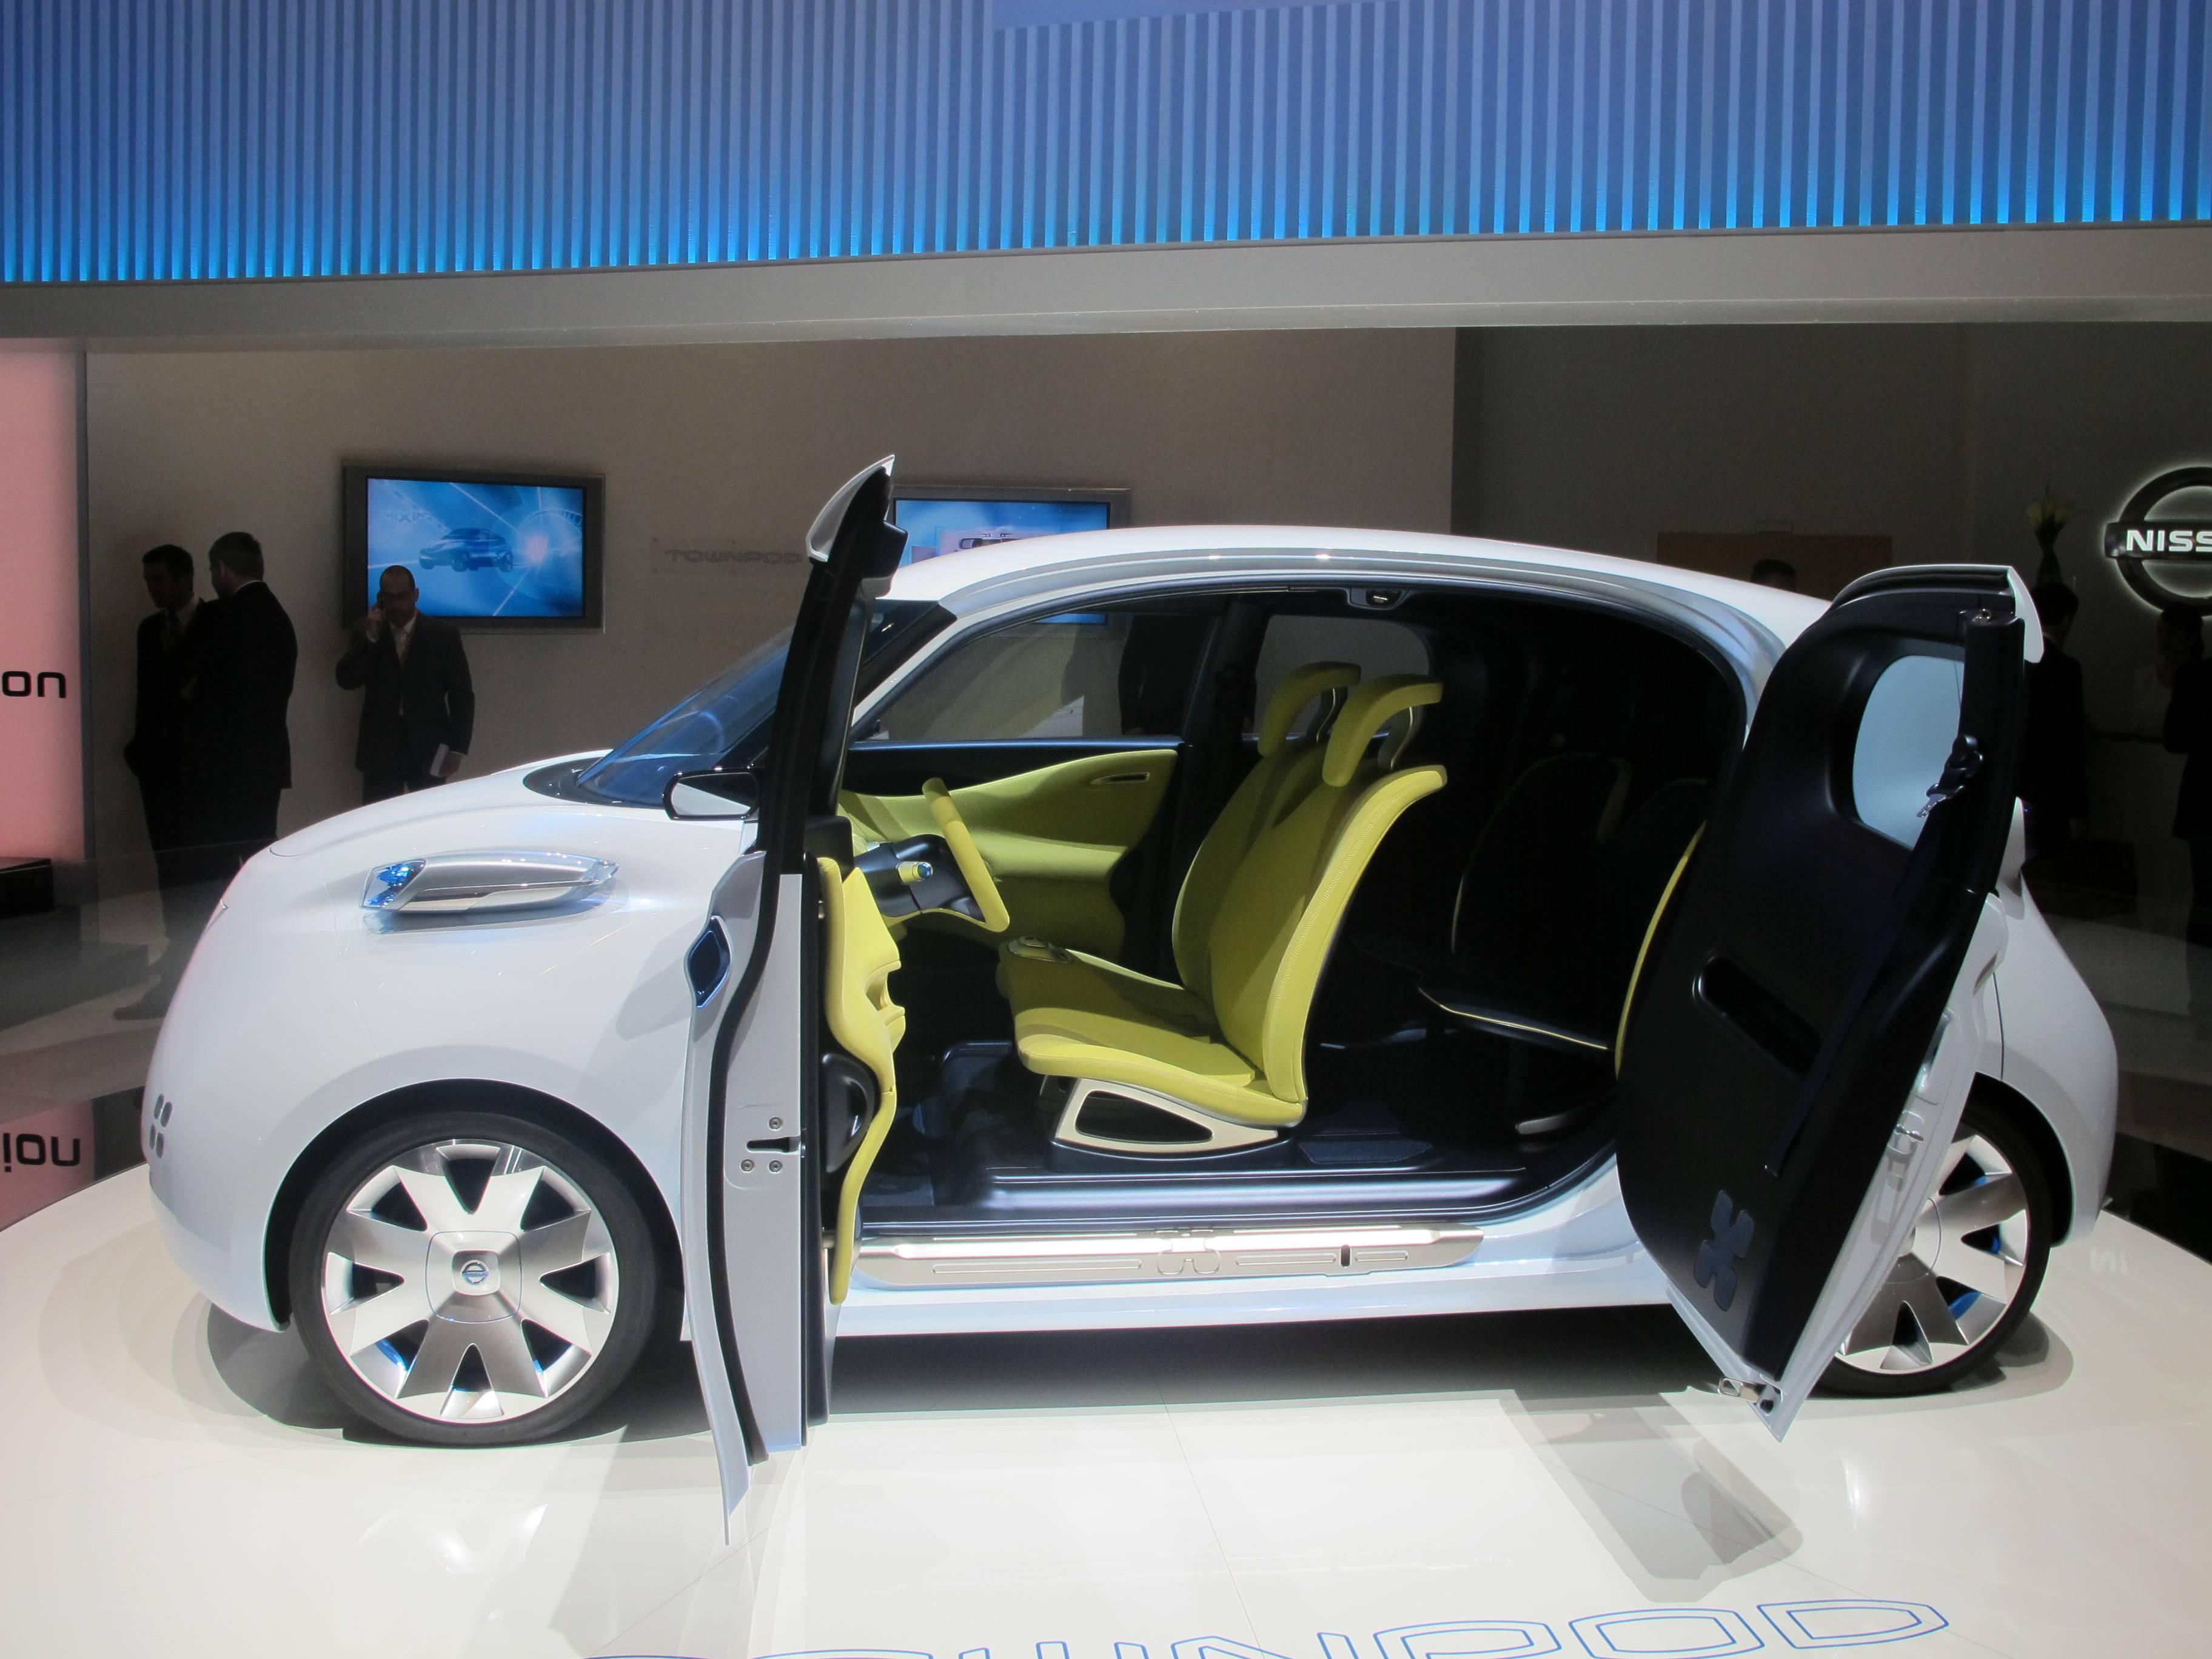 Geneva Auto Show - Nissan's Zero Emission TOWNPOD